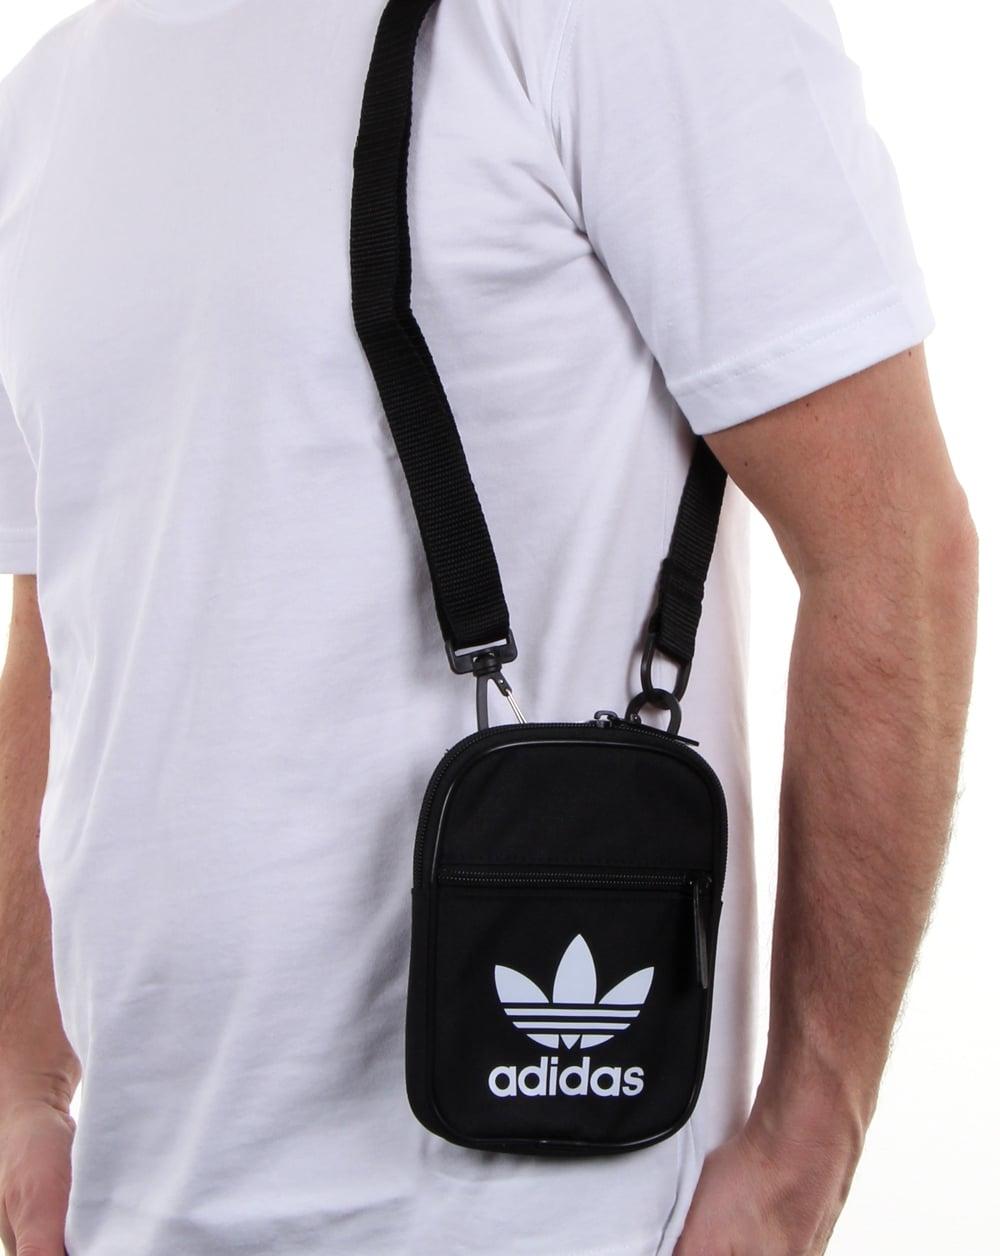 Buy small adidas messenger bag   OFF56% Discounted b6afa62fbf704